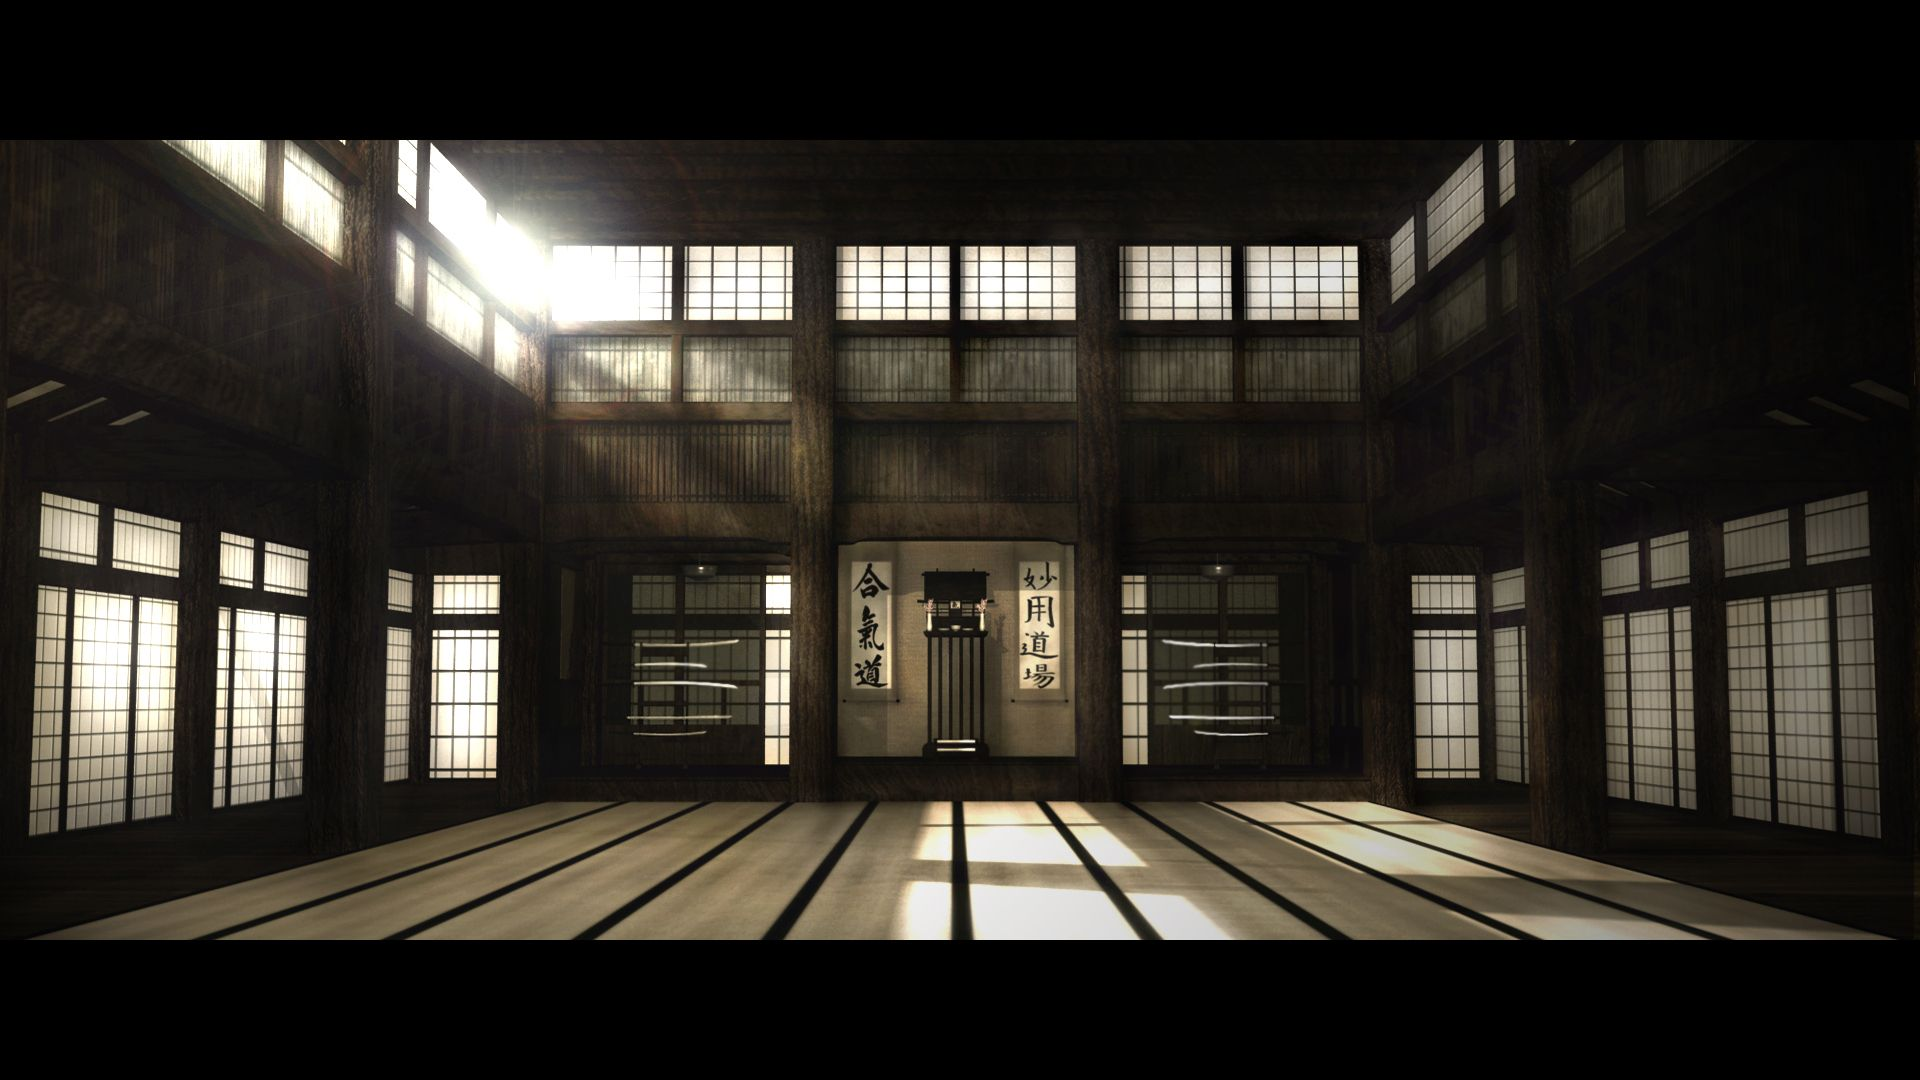 Download Dojo From the Matrix Wallpaper 伝統的な日本家屋, 写真